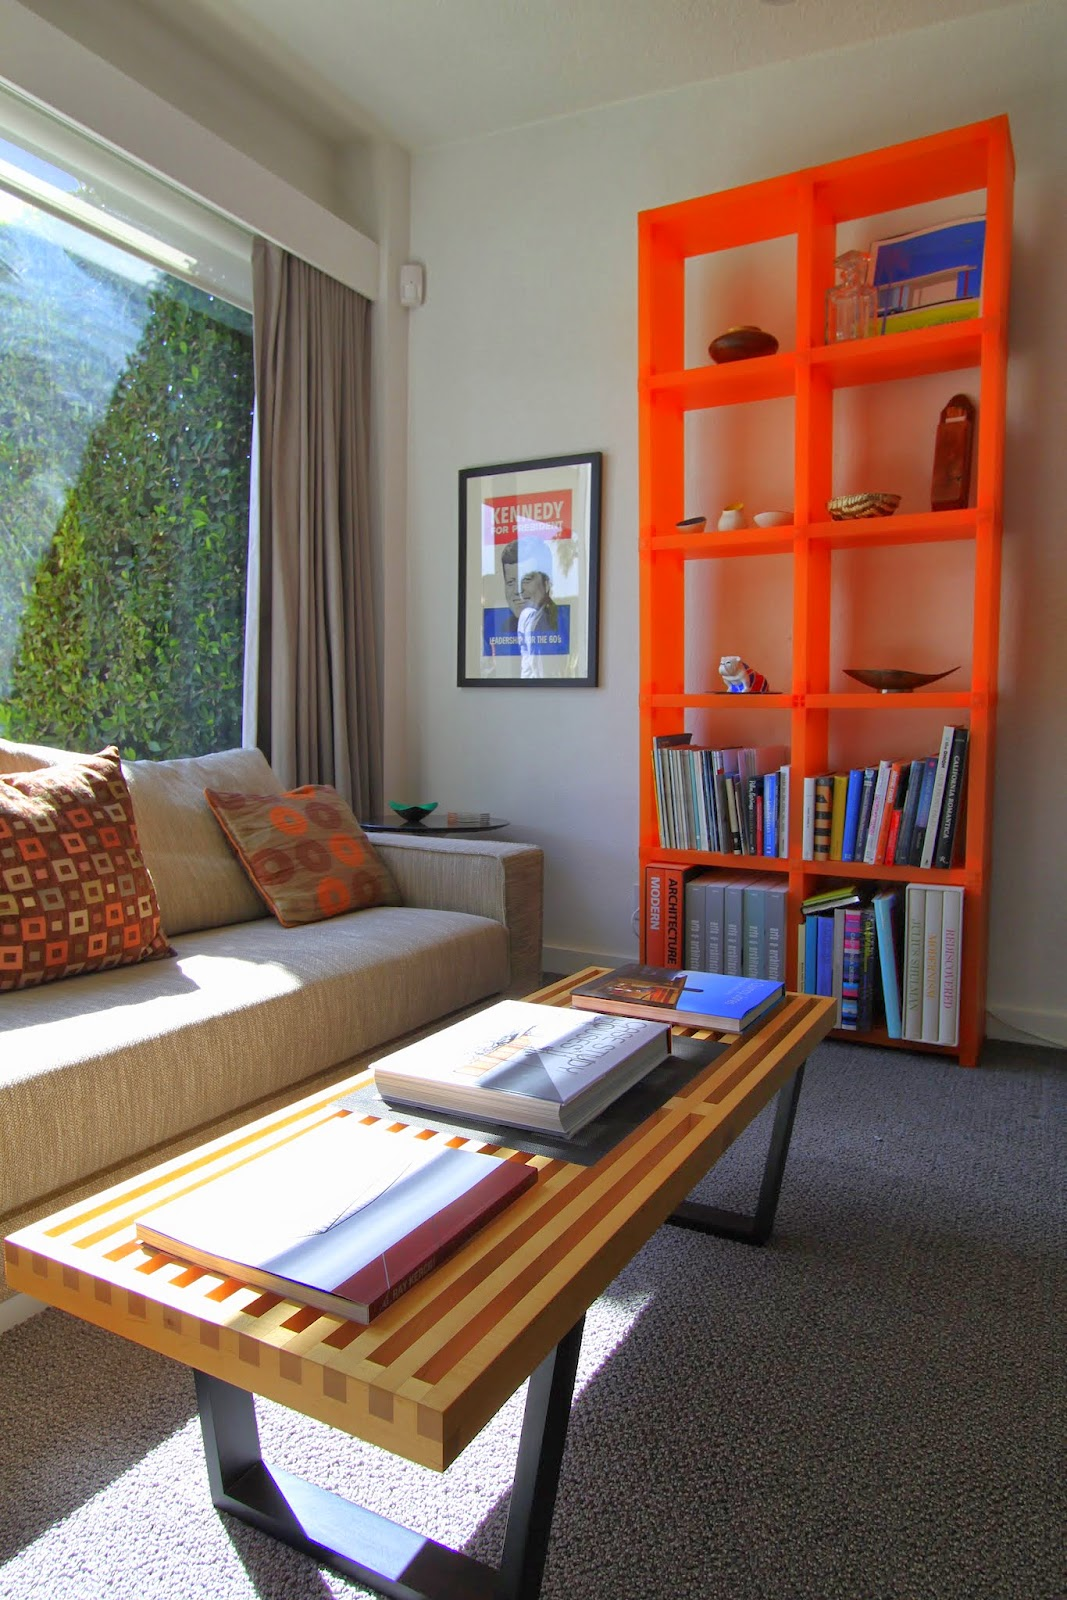 Palm Springs Modernism Week 2014, PSMW, Architect Herbert Burns, Comedian Joan Davis, Mid-Century Modern Home Tour